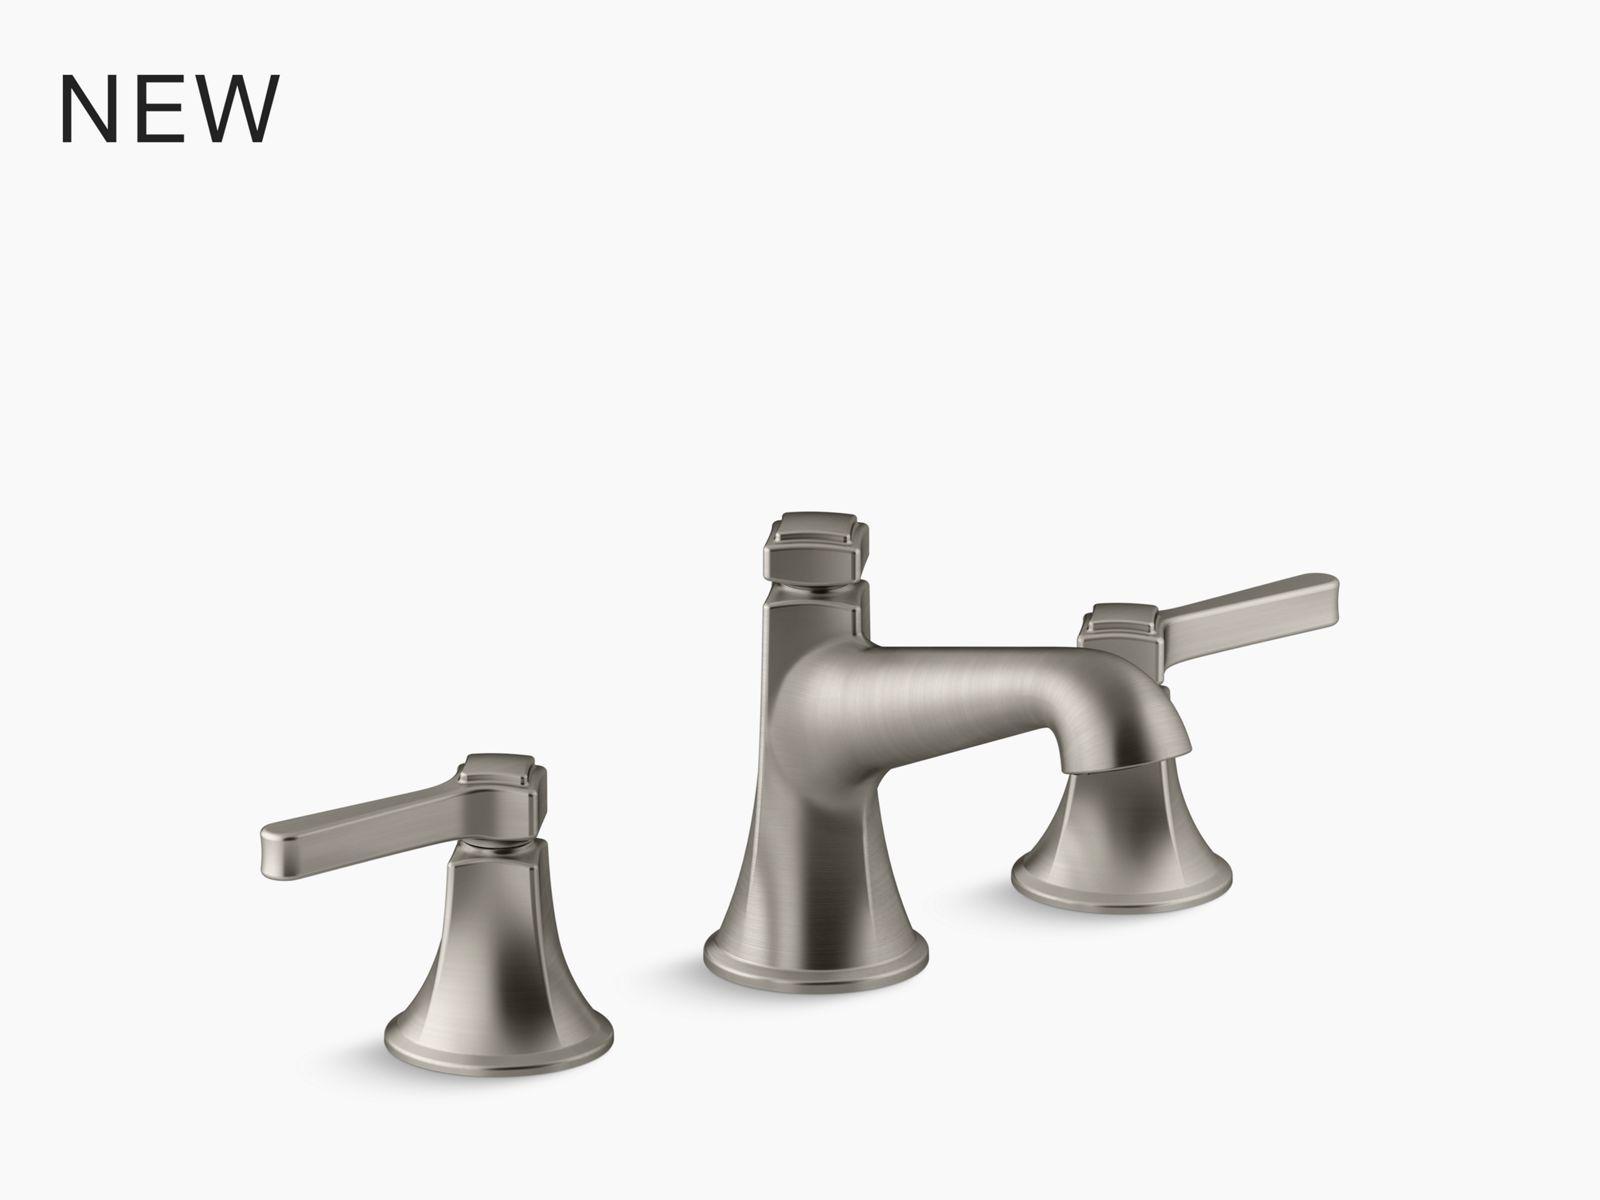 graze bar sink faucet with swing spout